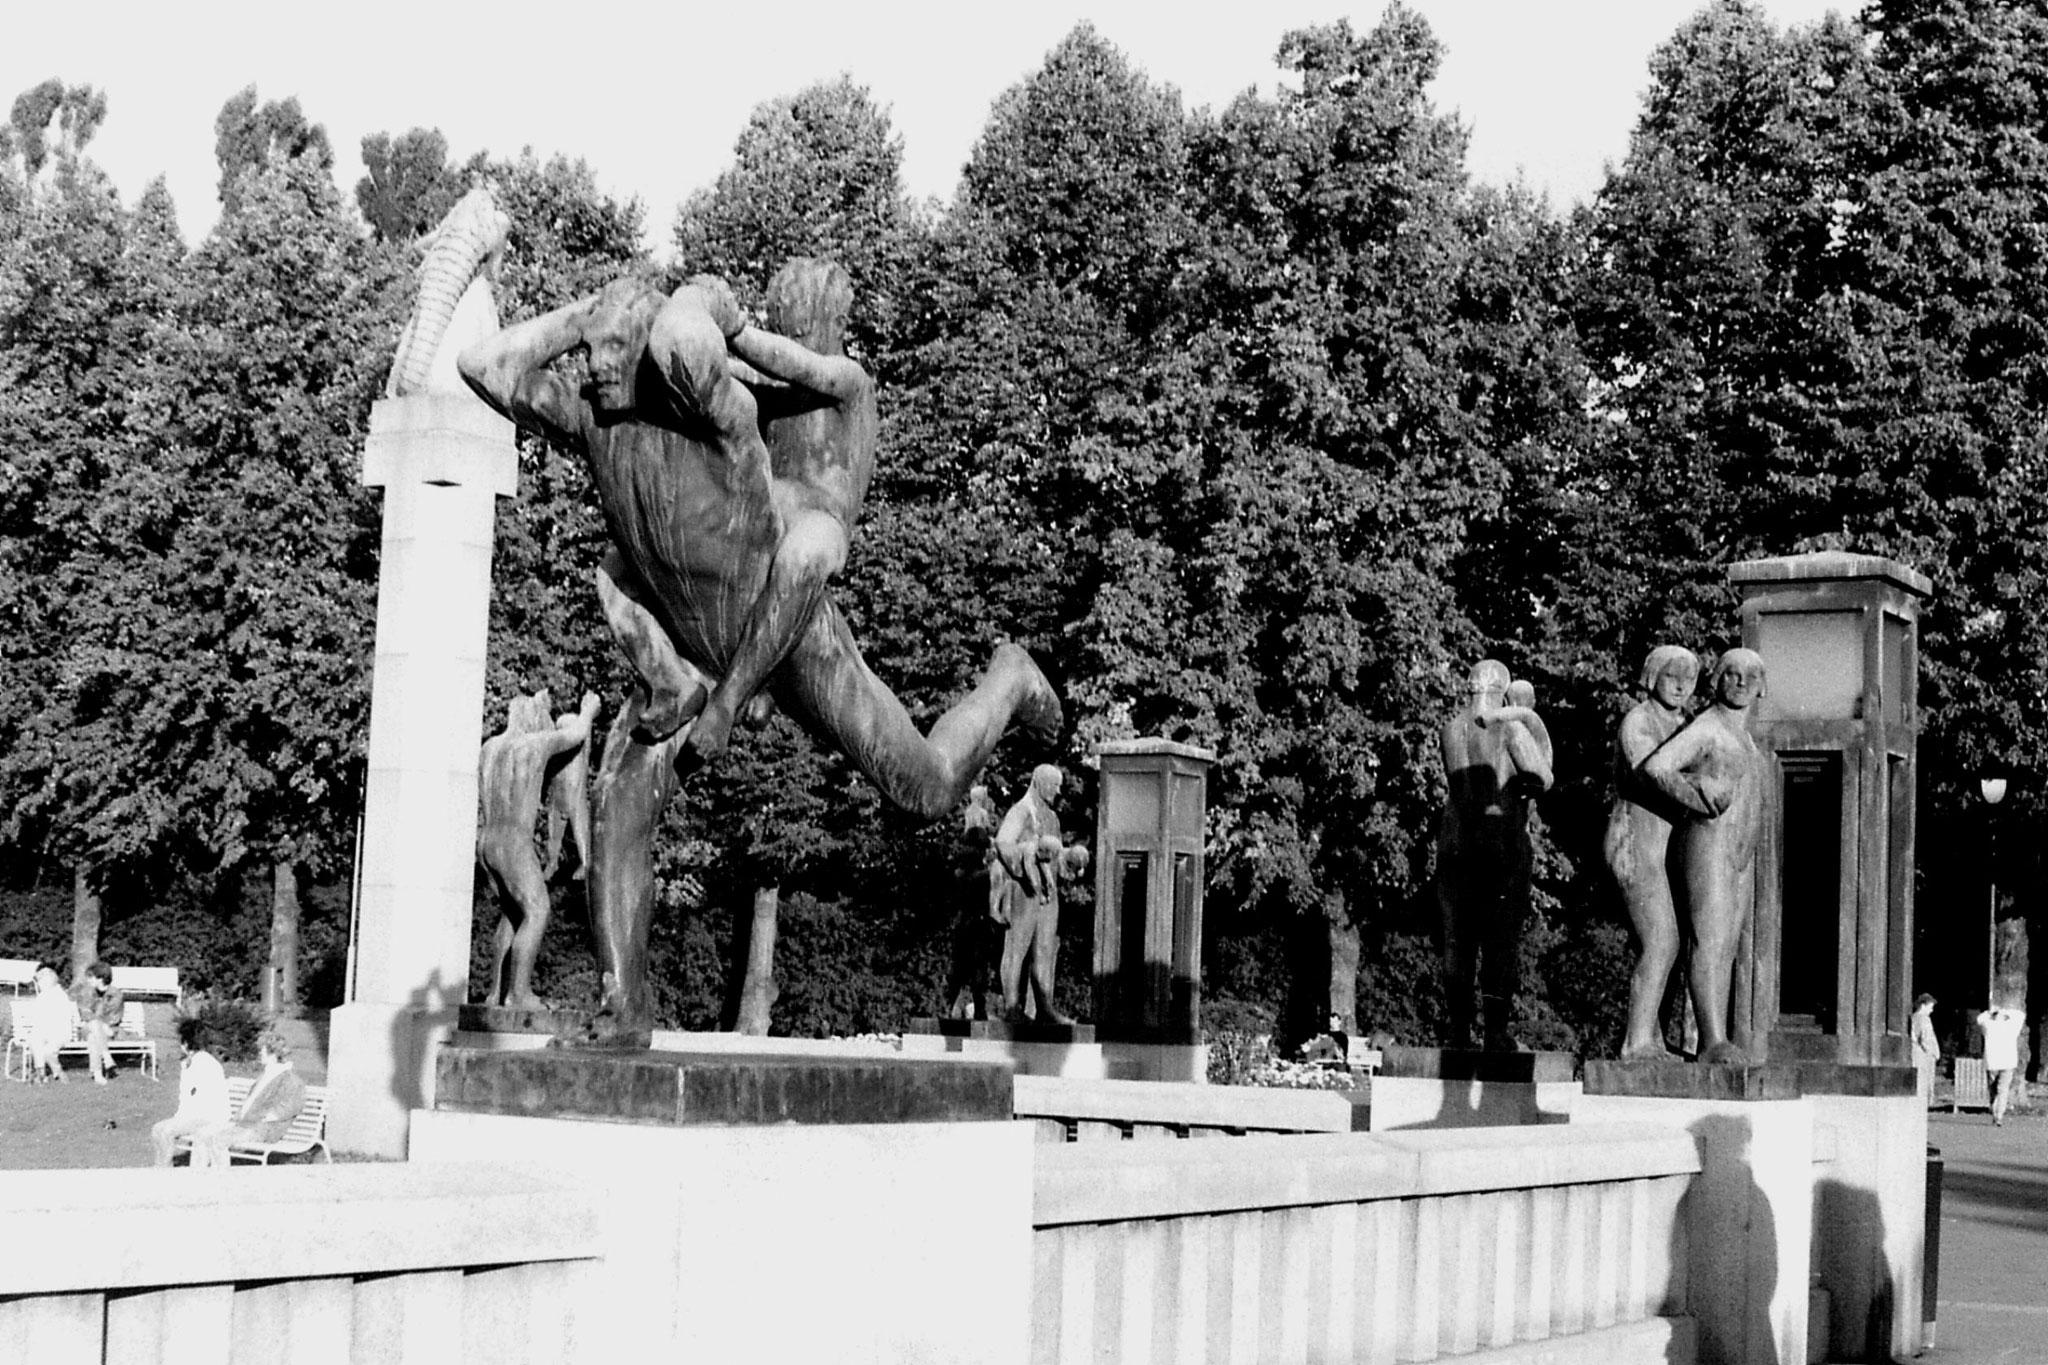 17/9/1988: 18: Vigeland sculpture park